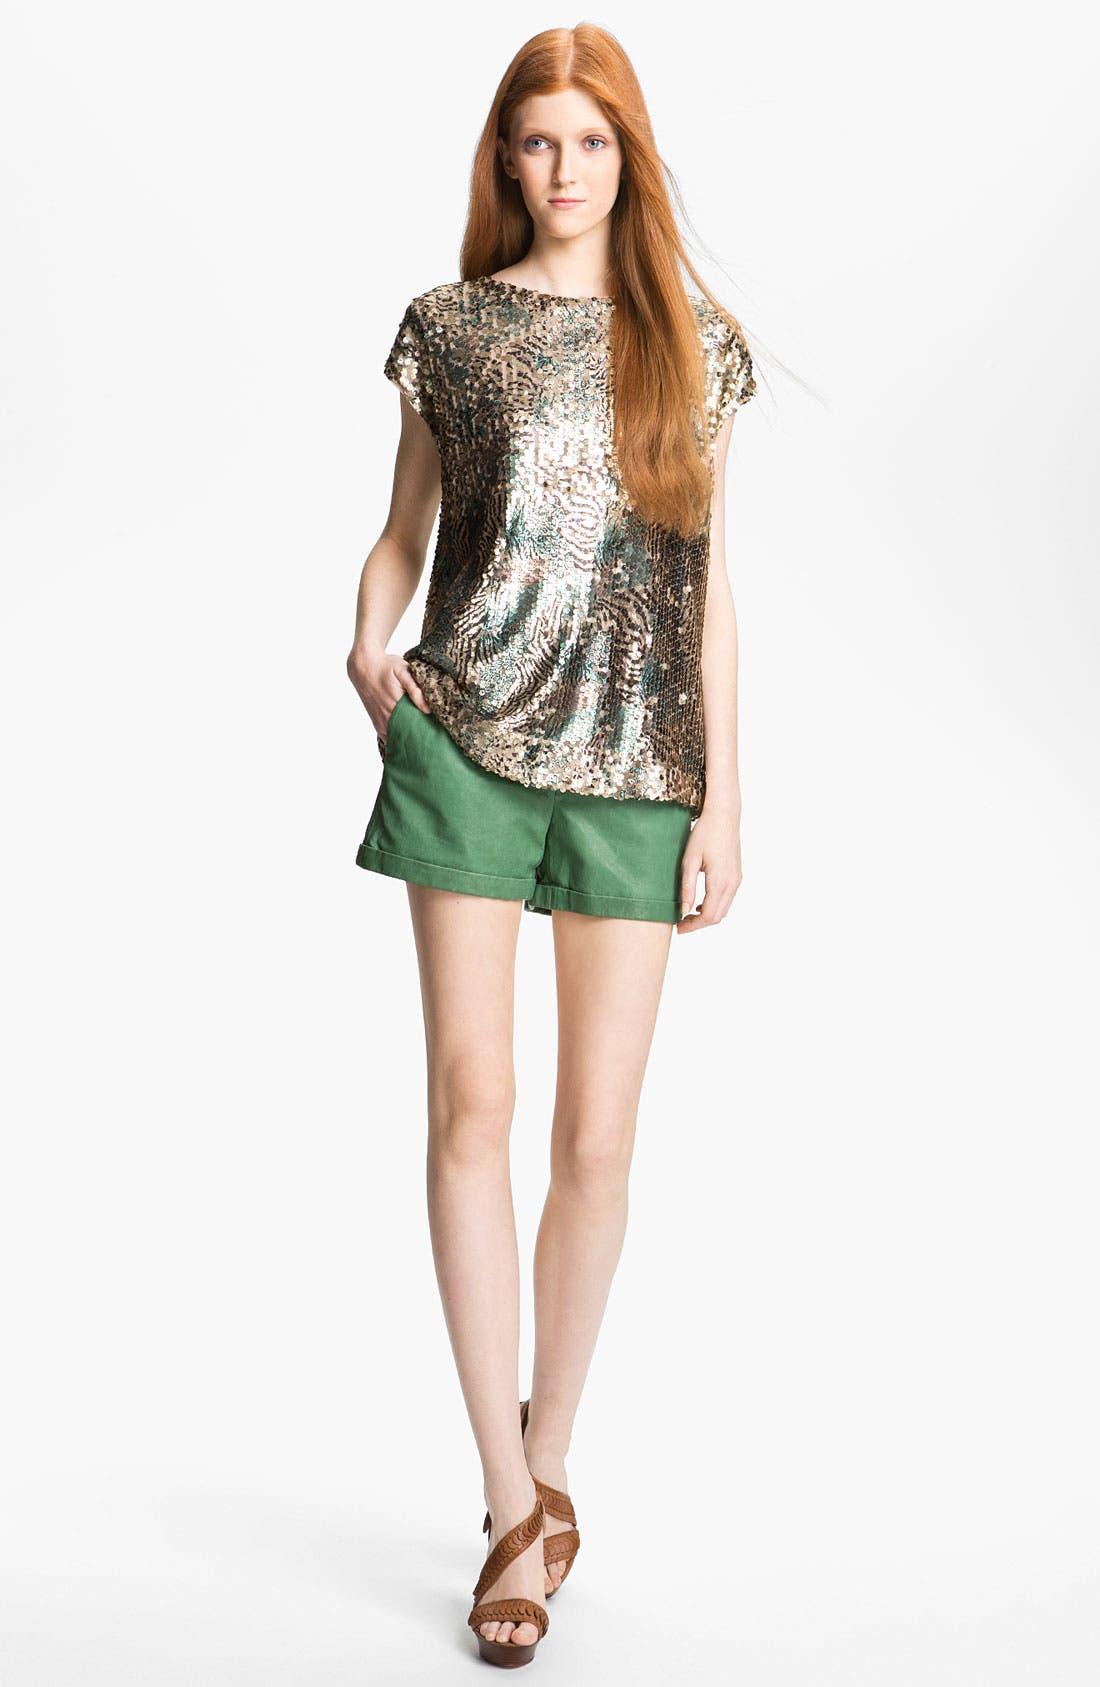 Alternate Image 1 Selected - Rachel Zoe 'Ashlynn' Sequin Top